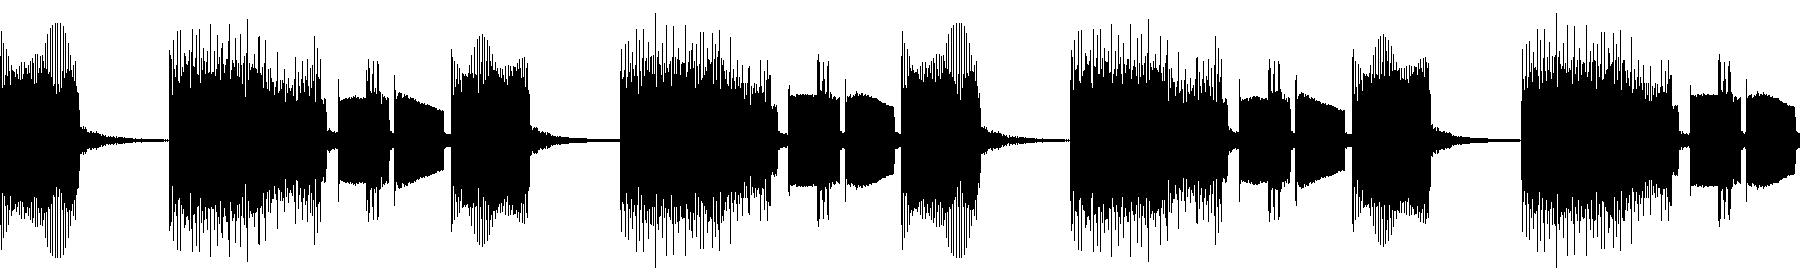 90 d 13